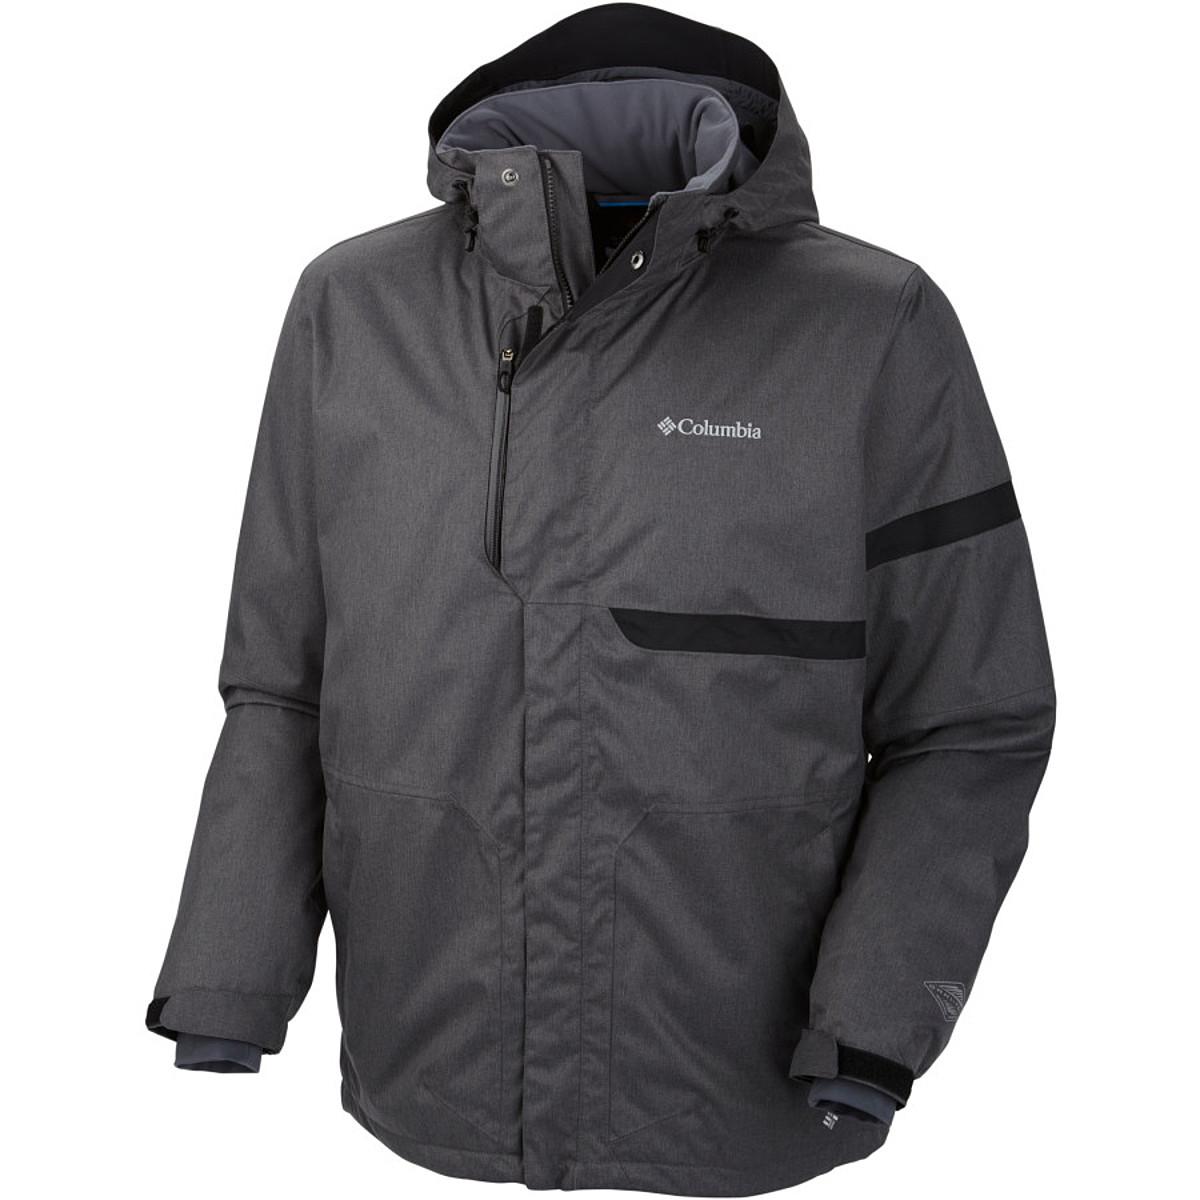 Columbia Fusion Exact Jacket